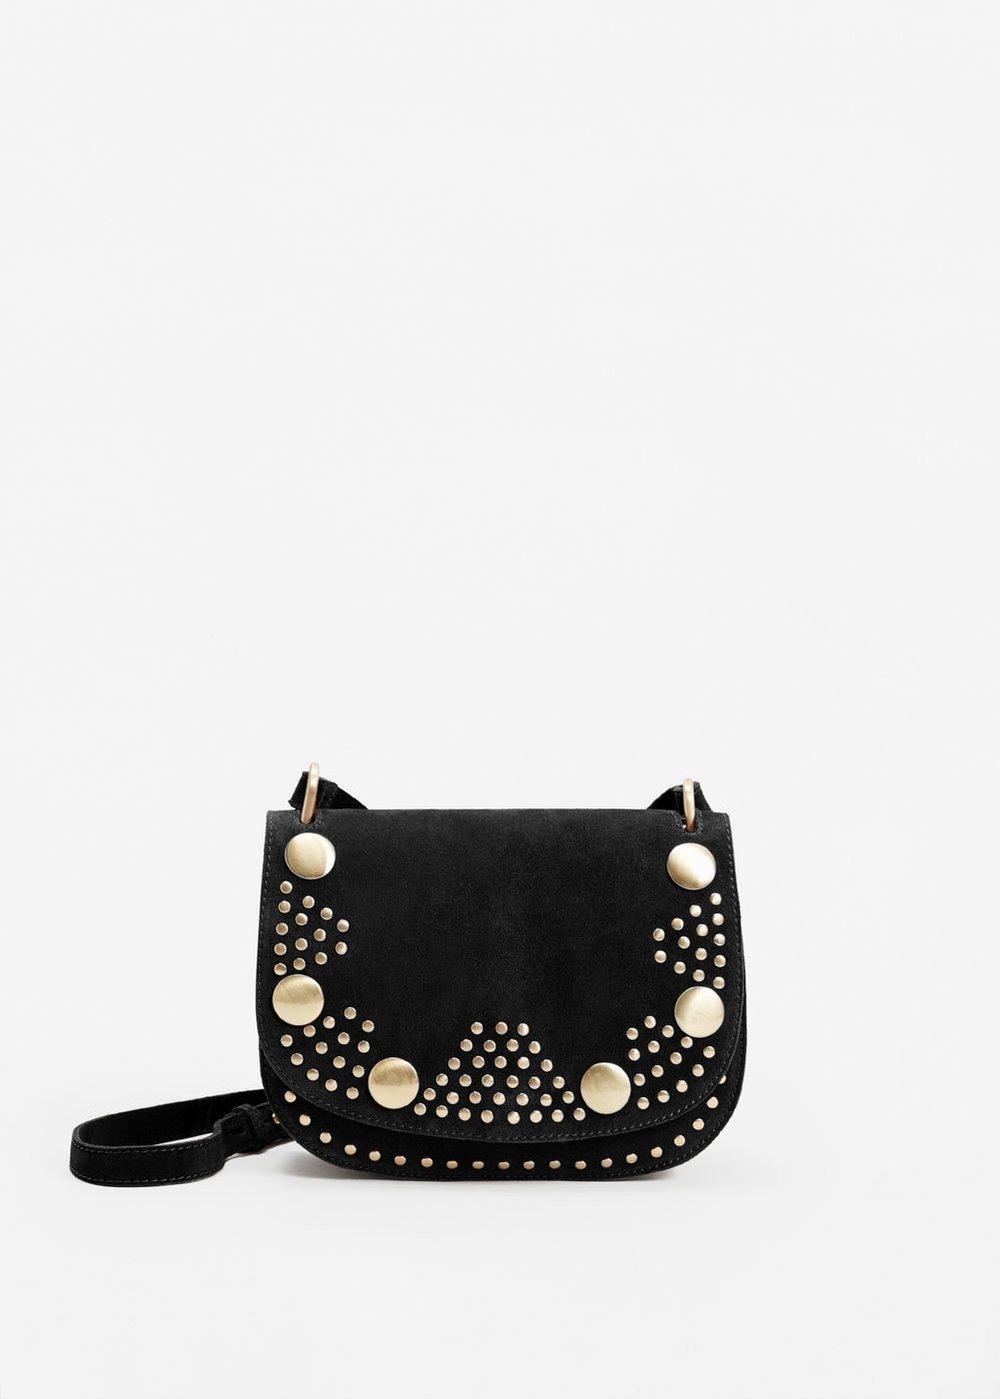 Stud Leather Crossbody Bag £59.99 at Mango